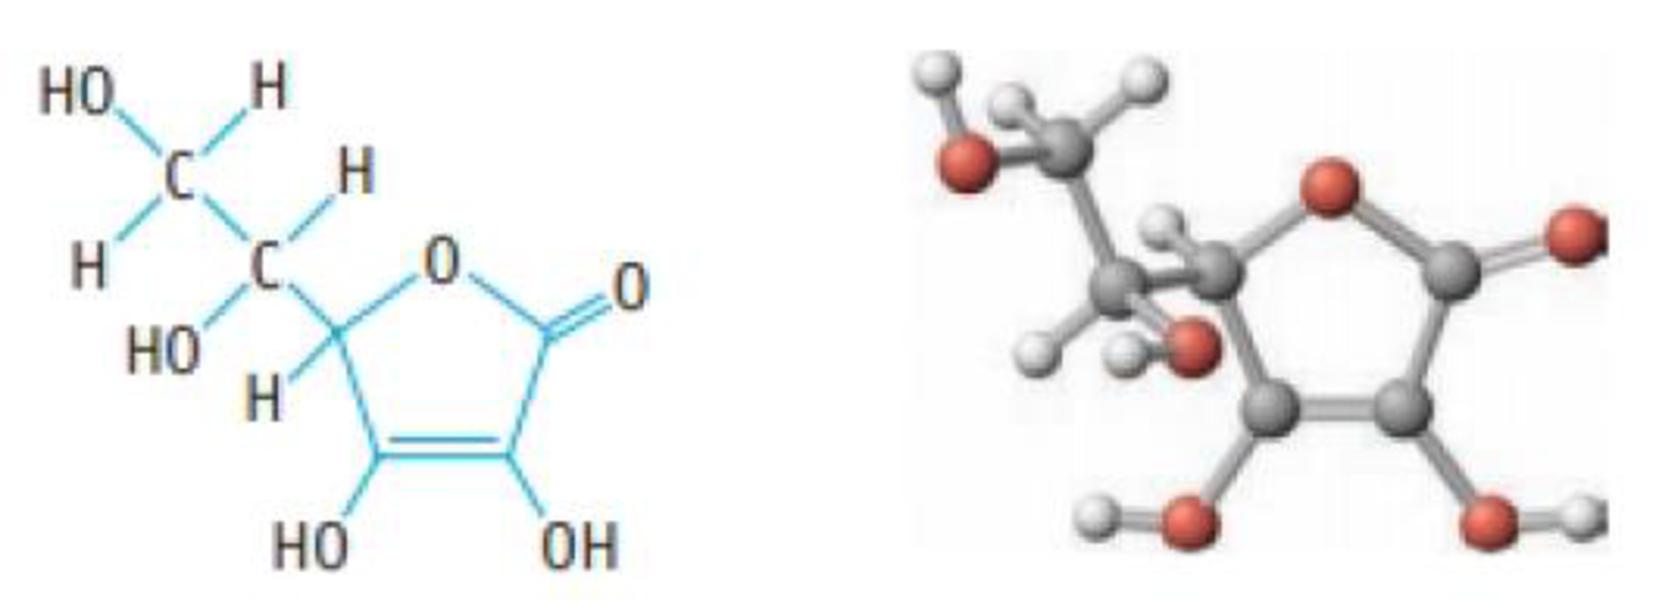 Chapter 16, Problem 72PS, Ascorbic acid (vitamin C, C6H8O6) is a diprotic acid (Ka1 = 6.8  105 and Ka2 = 2.7  1012). What is